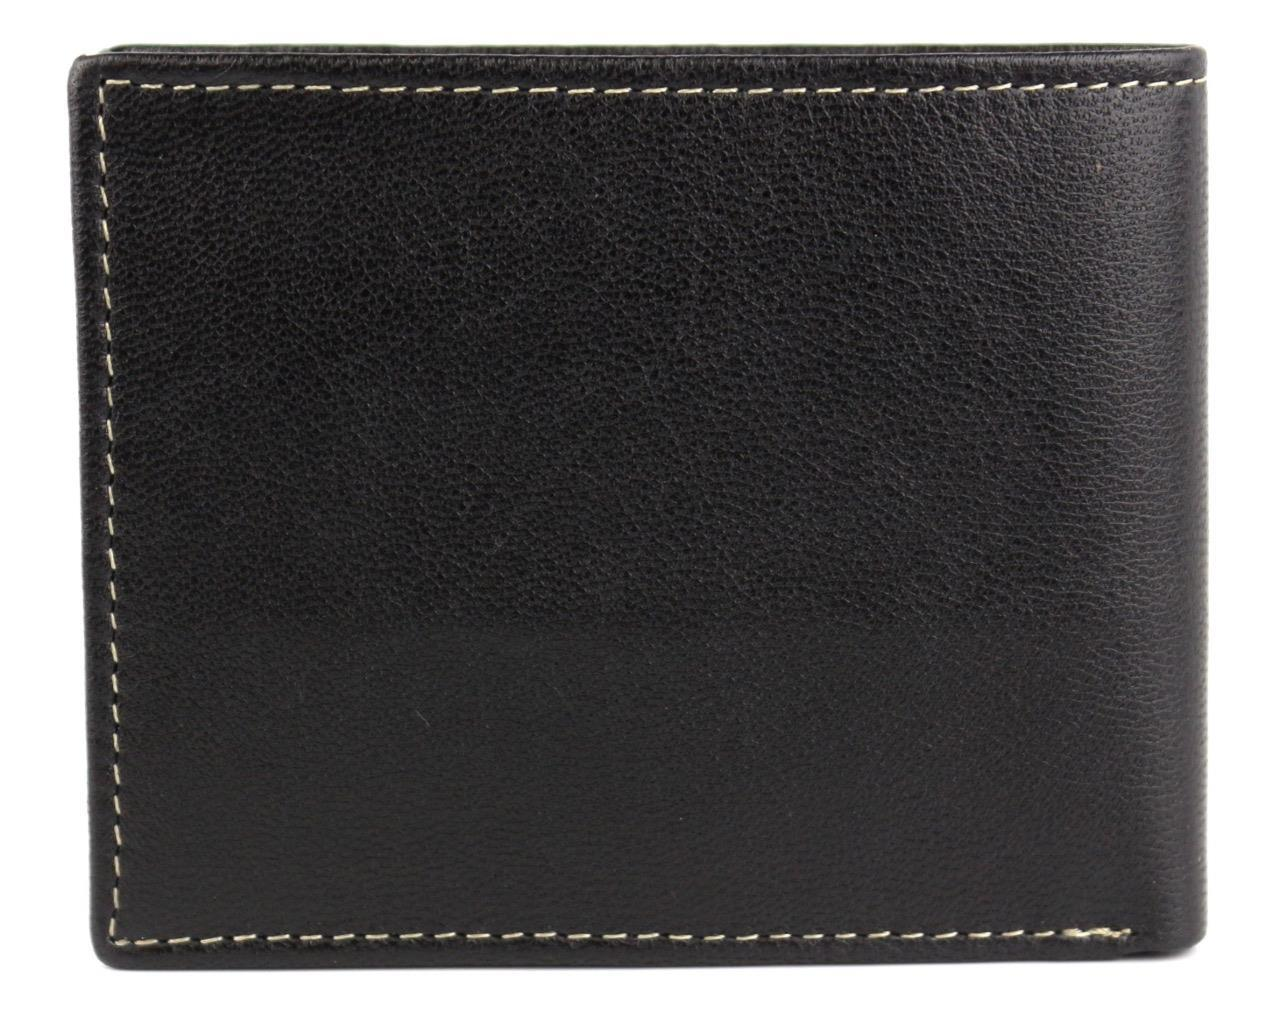 Timberland-Men-039-s-Blix-Slim-Bifold-Leather-Wallet thumbnail 7